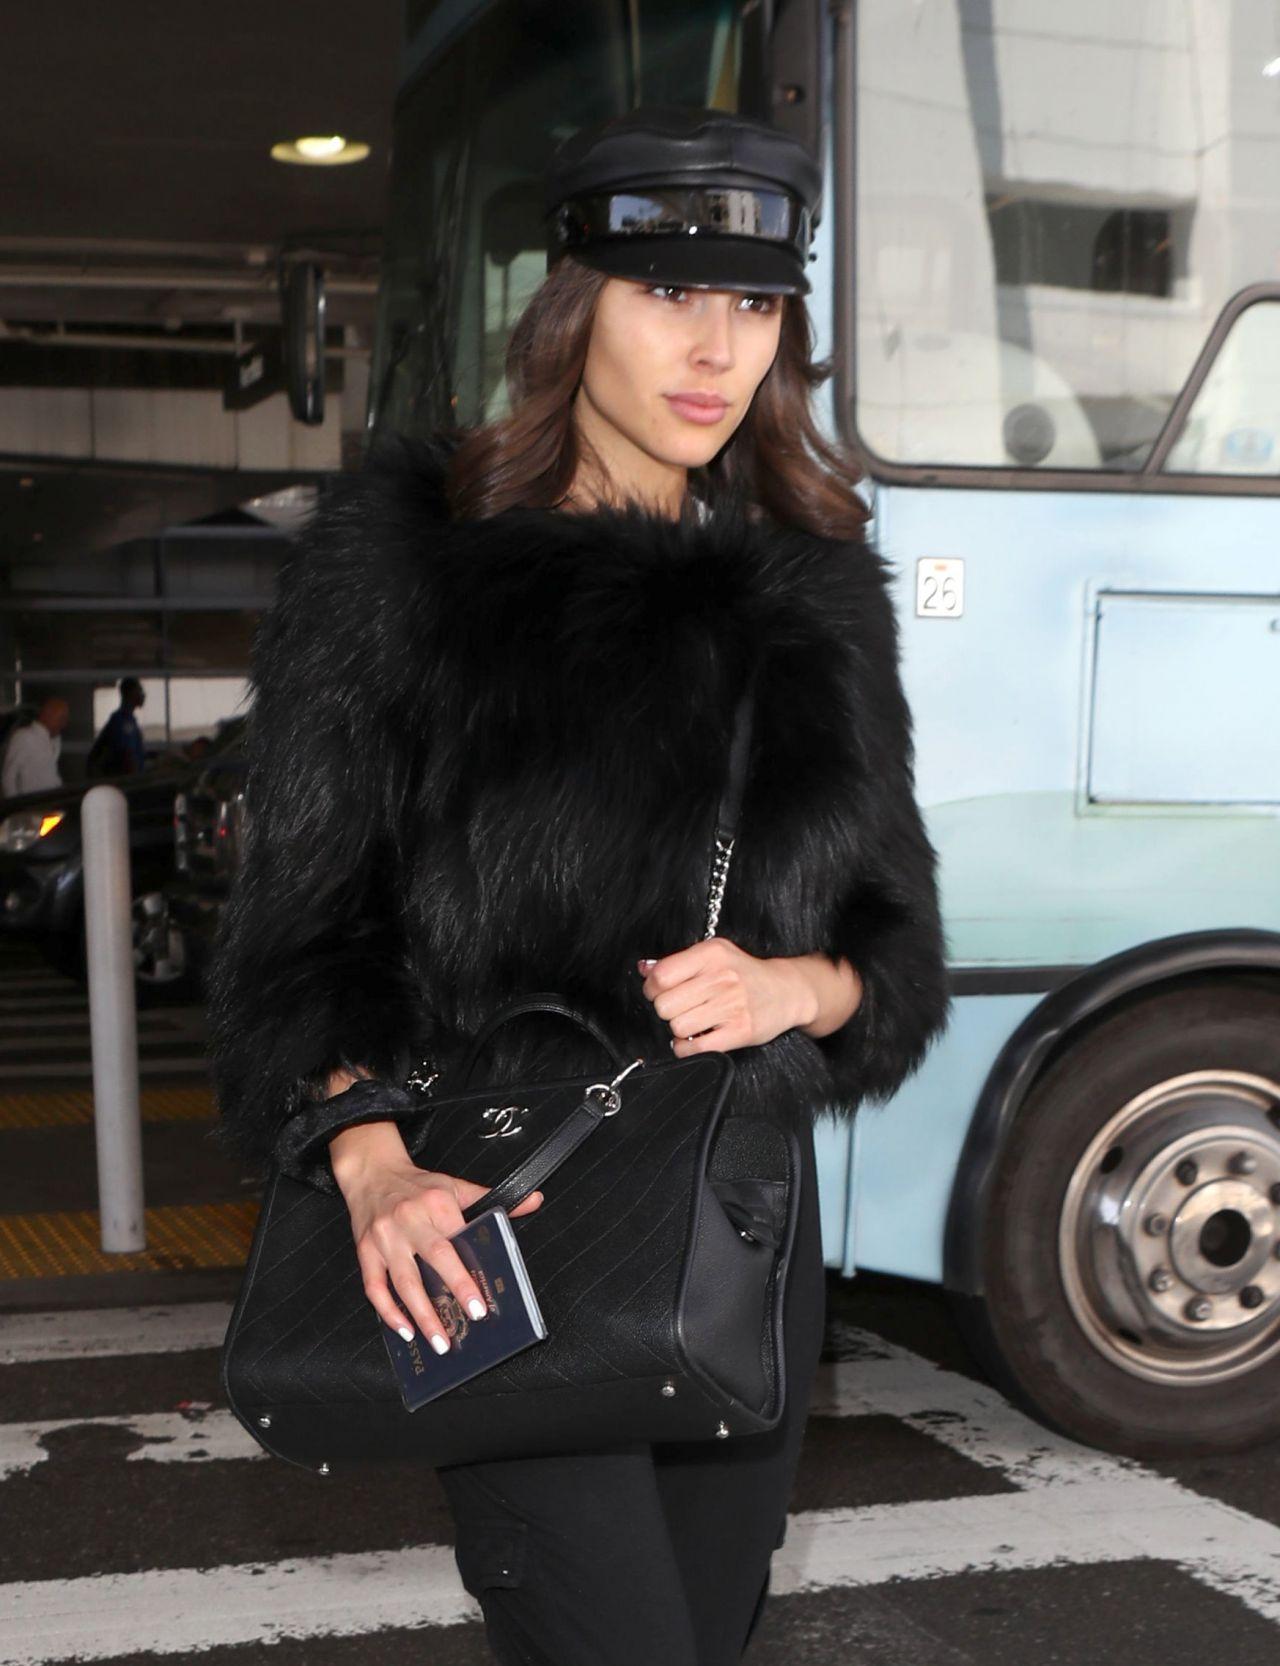 Olivia Culpo Wearing A Furry Black Crop Top And Black